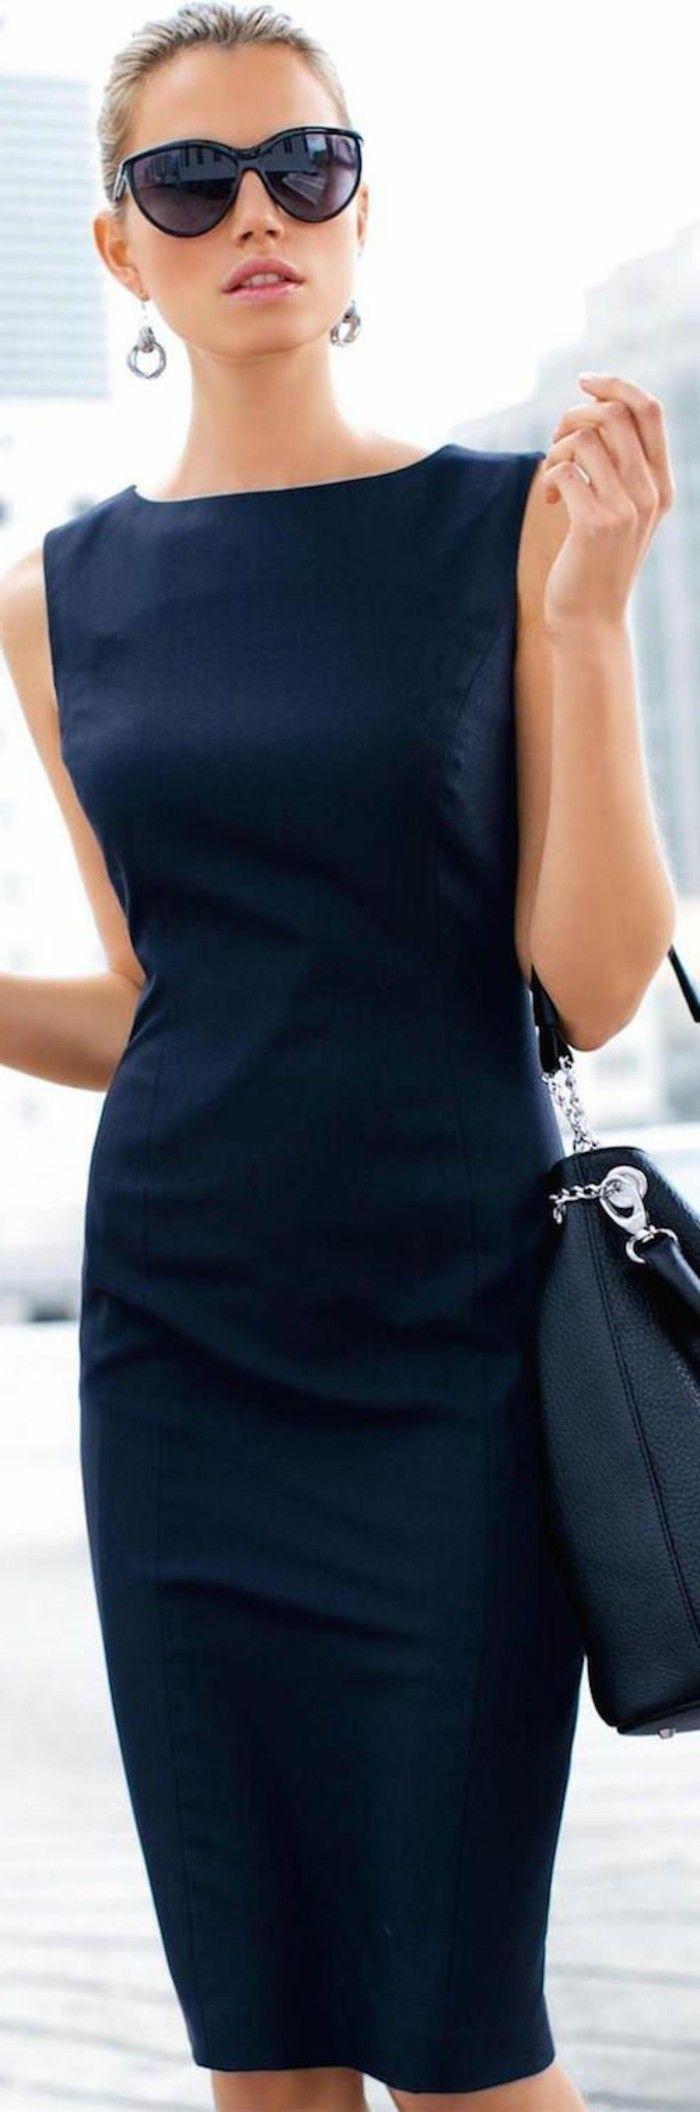 Schwarzes kleid elegant